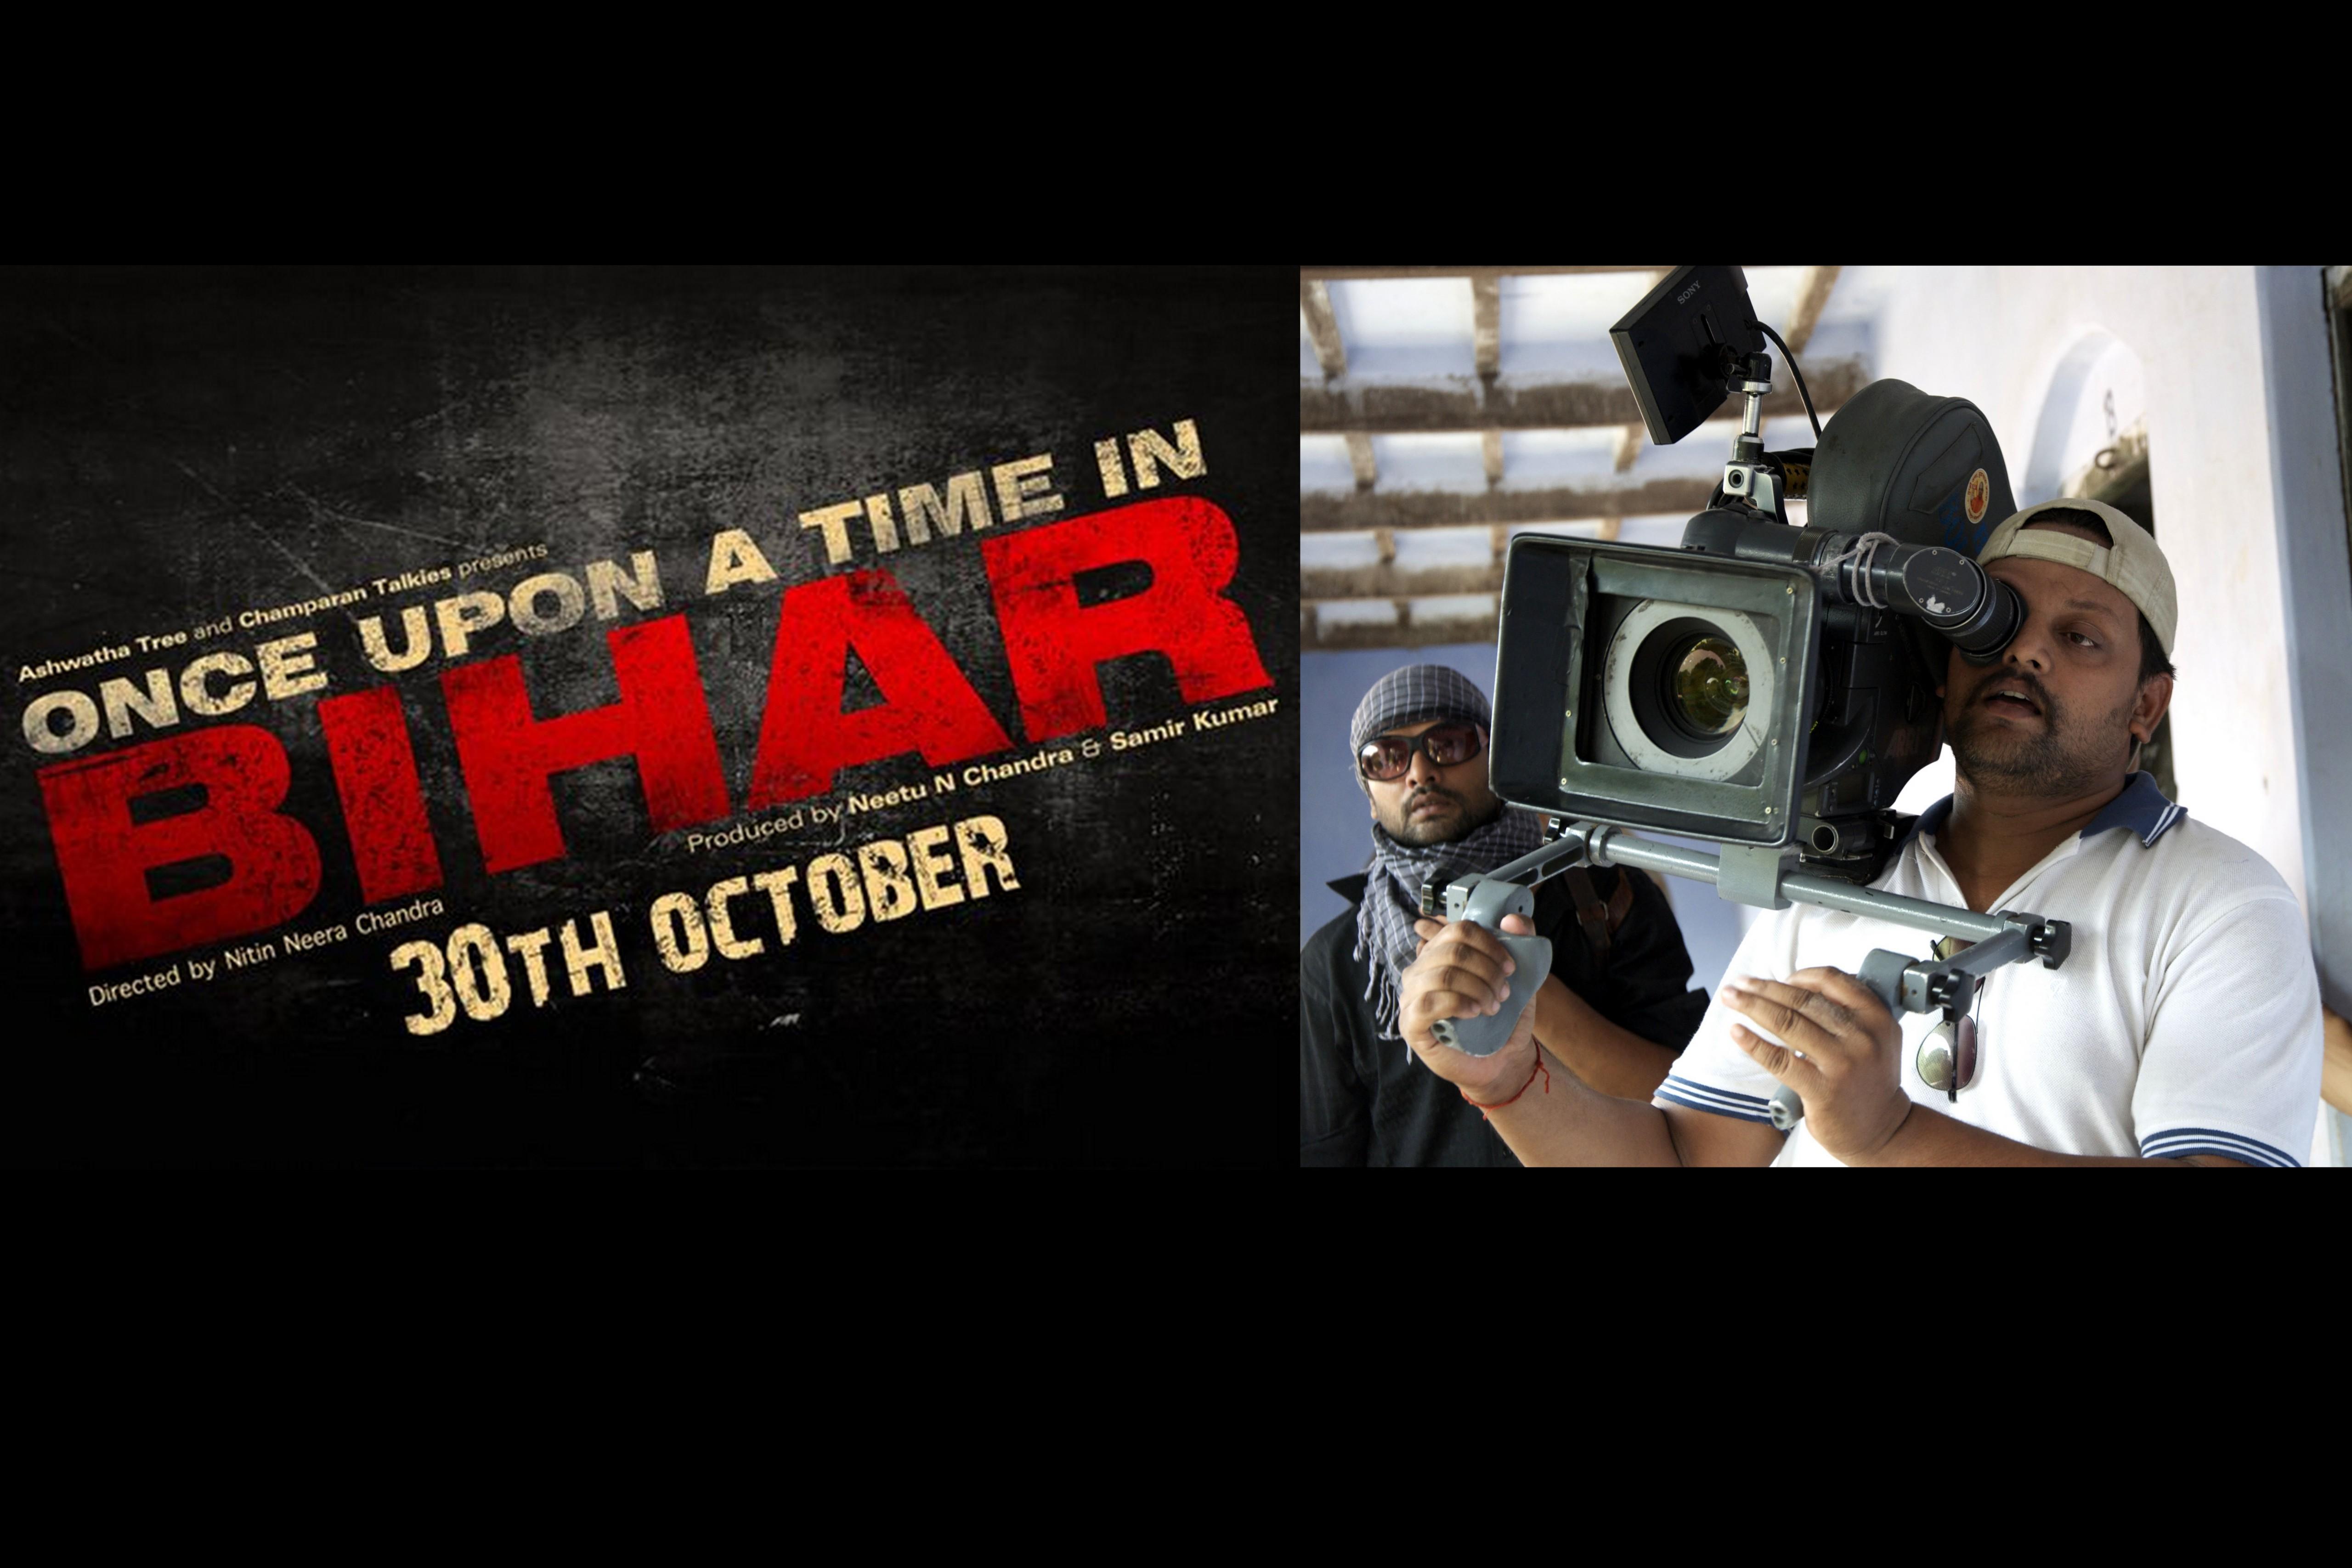 Director Nitin Chandra on OUATIB, a face changing saga